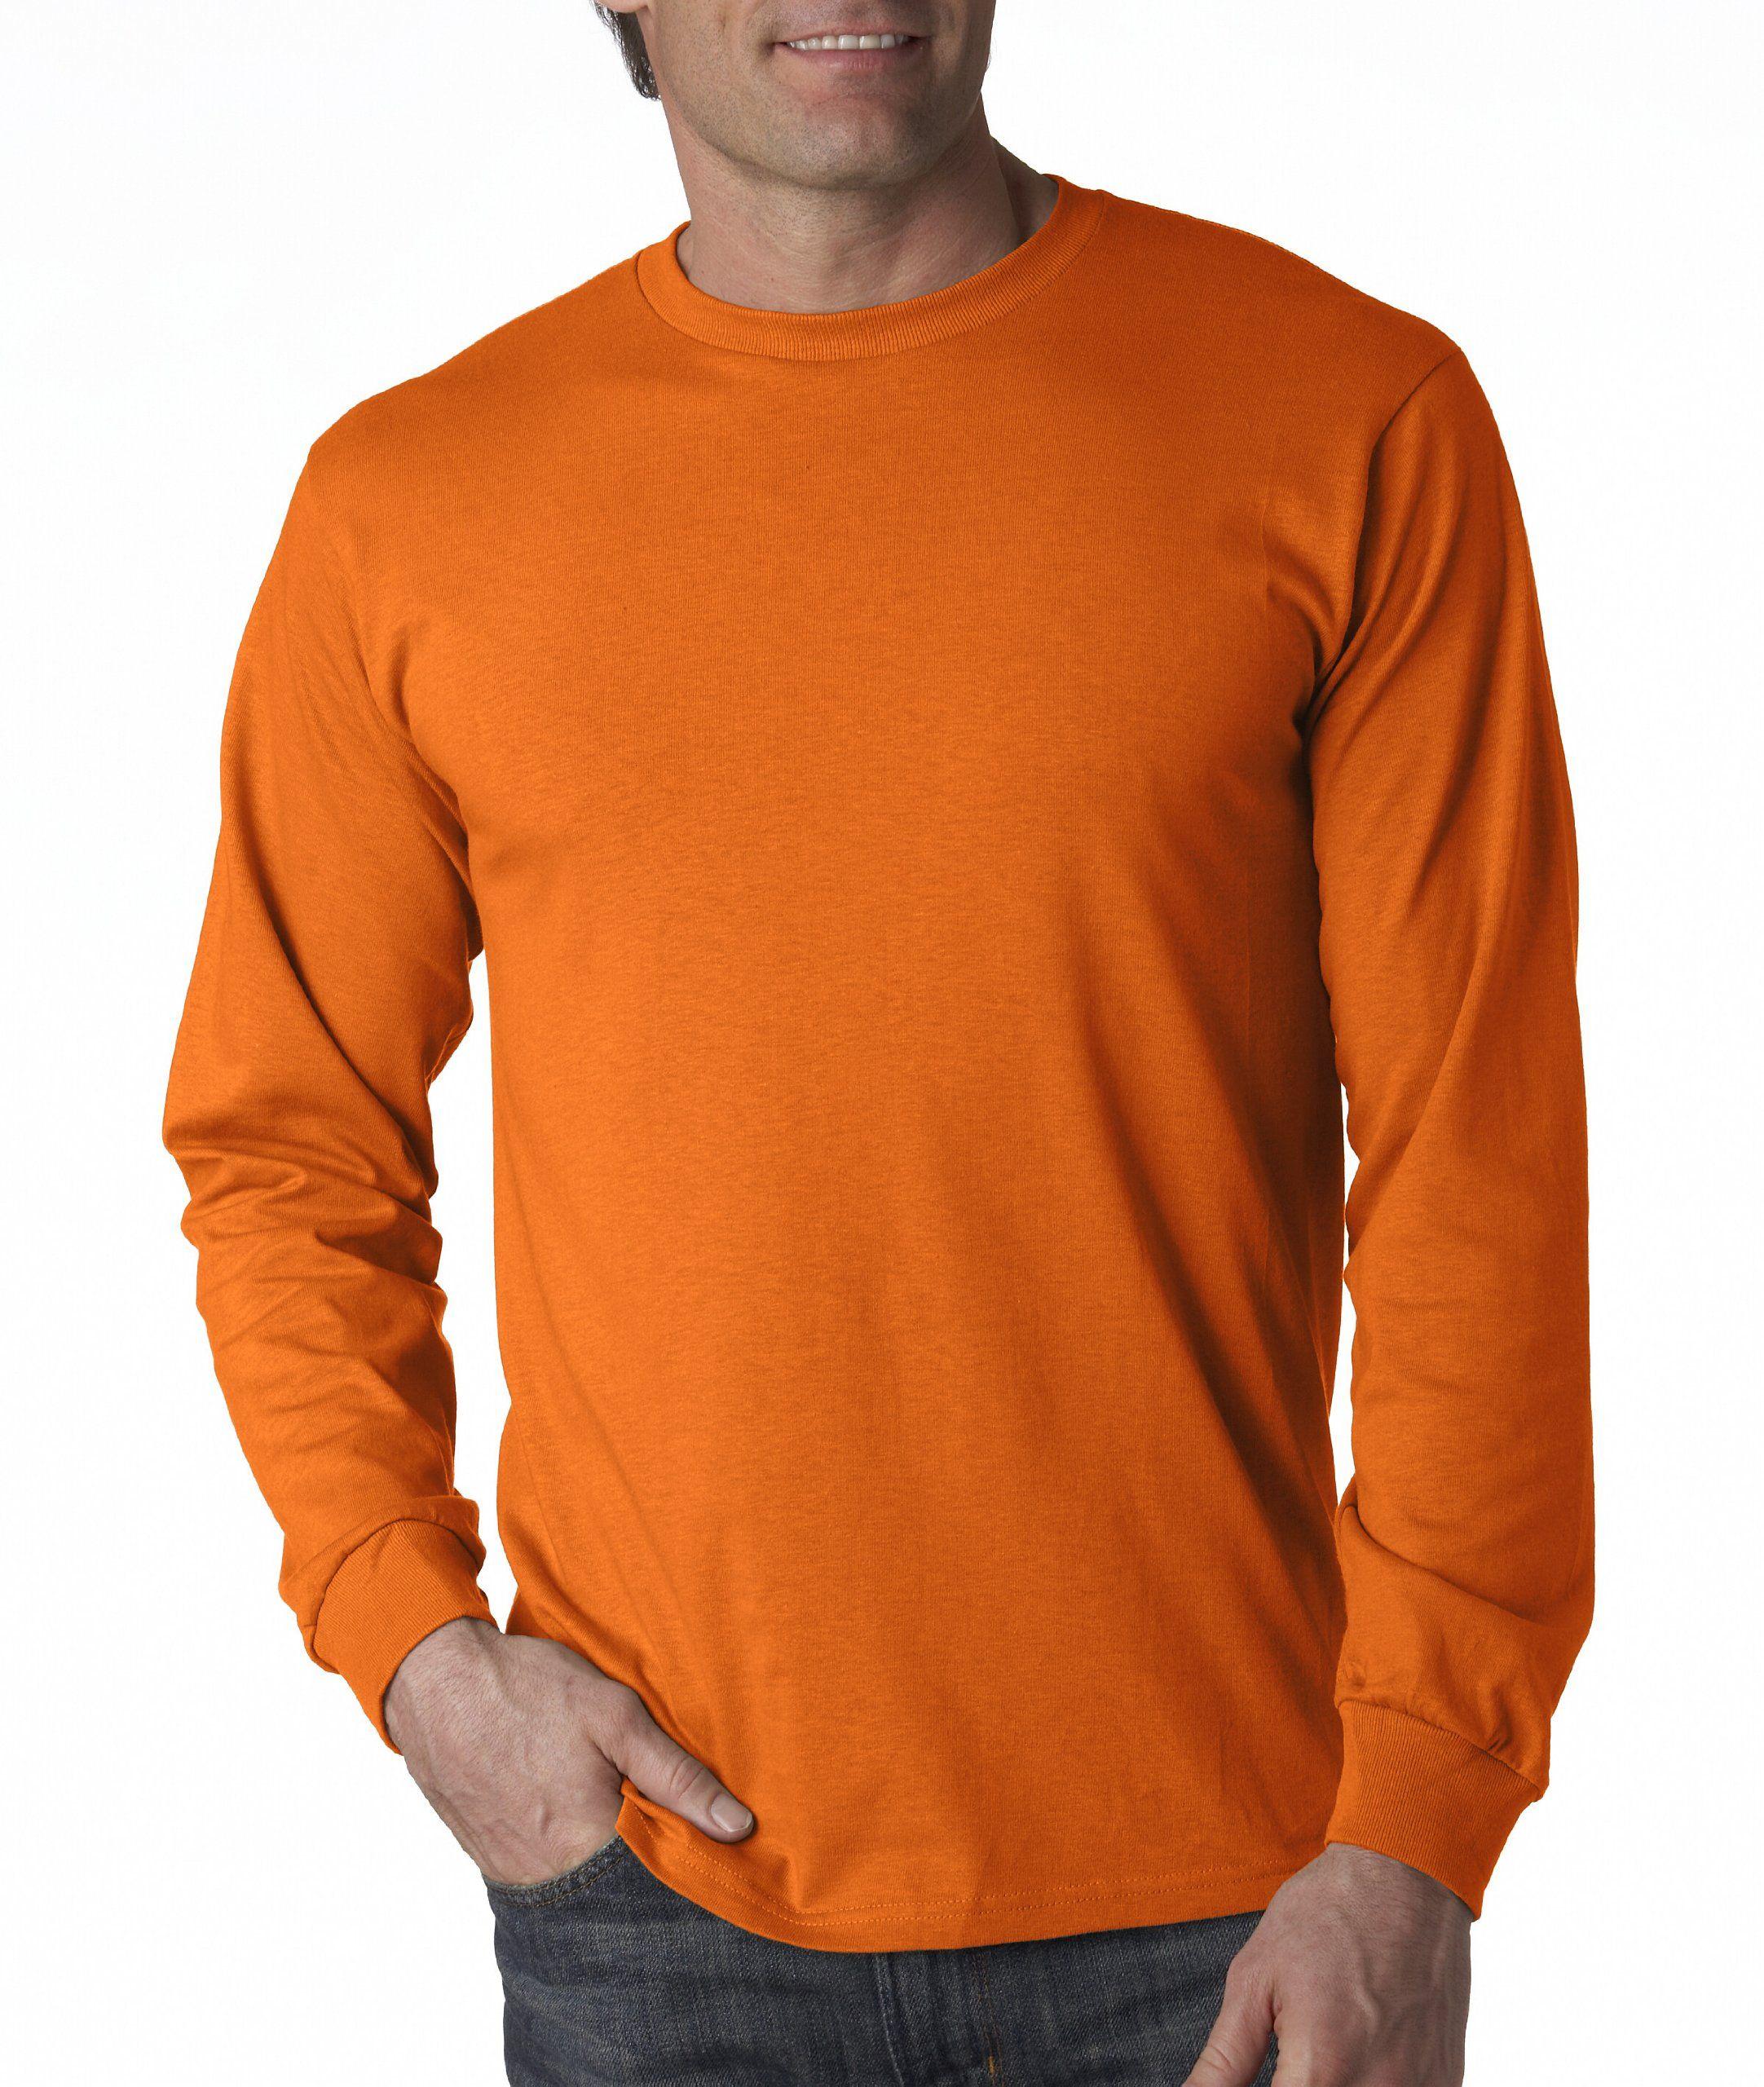 Fruit of the loom oz heavy cotton hd longsleeve tshirt